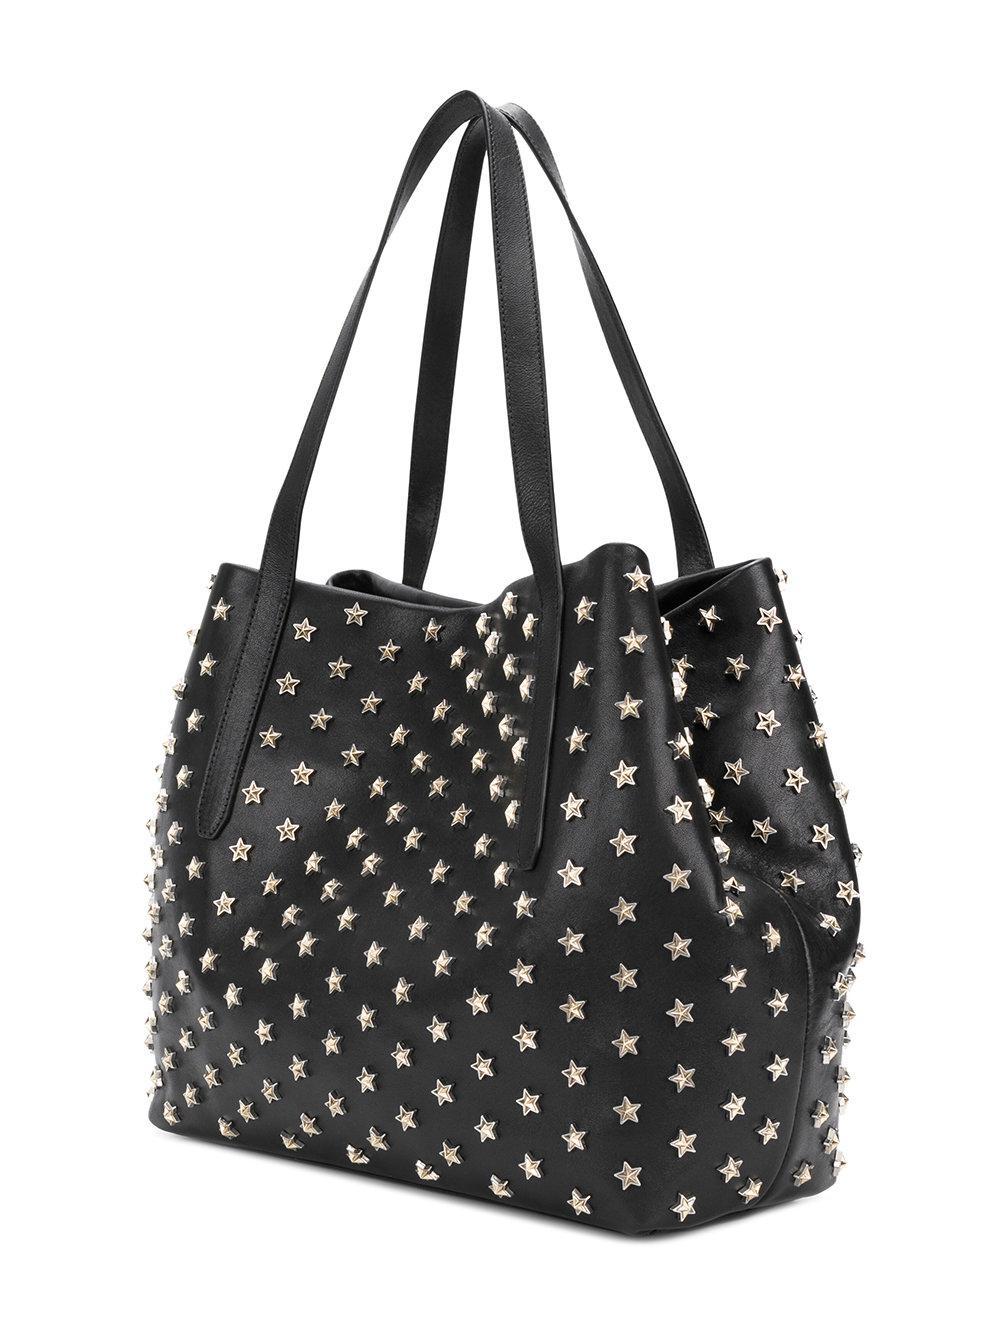 Jimmy Choo Leather Sofia Medium Star Studded Tote Bag in Black